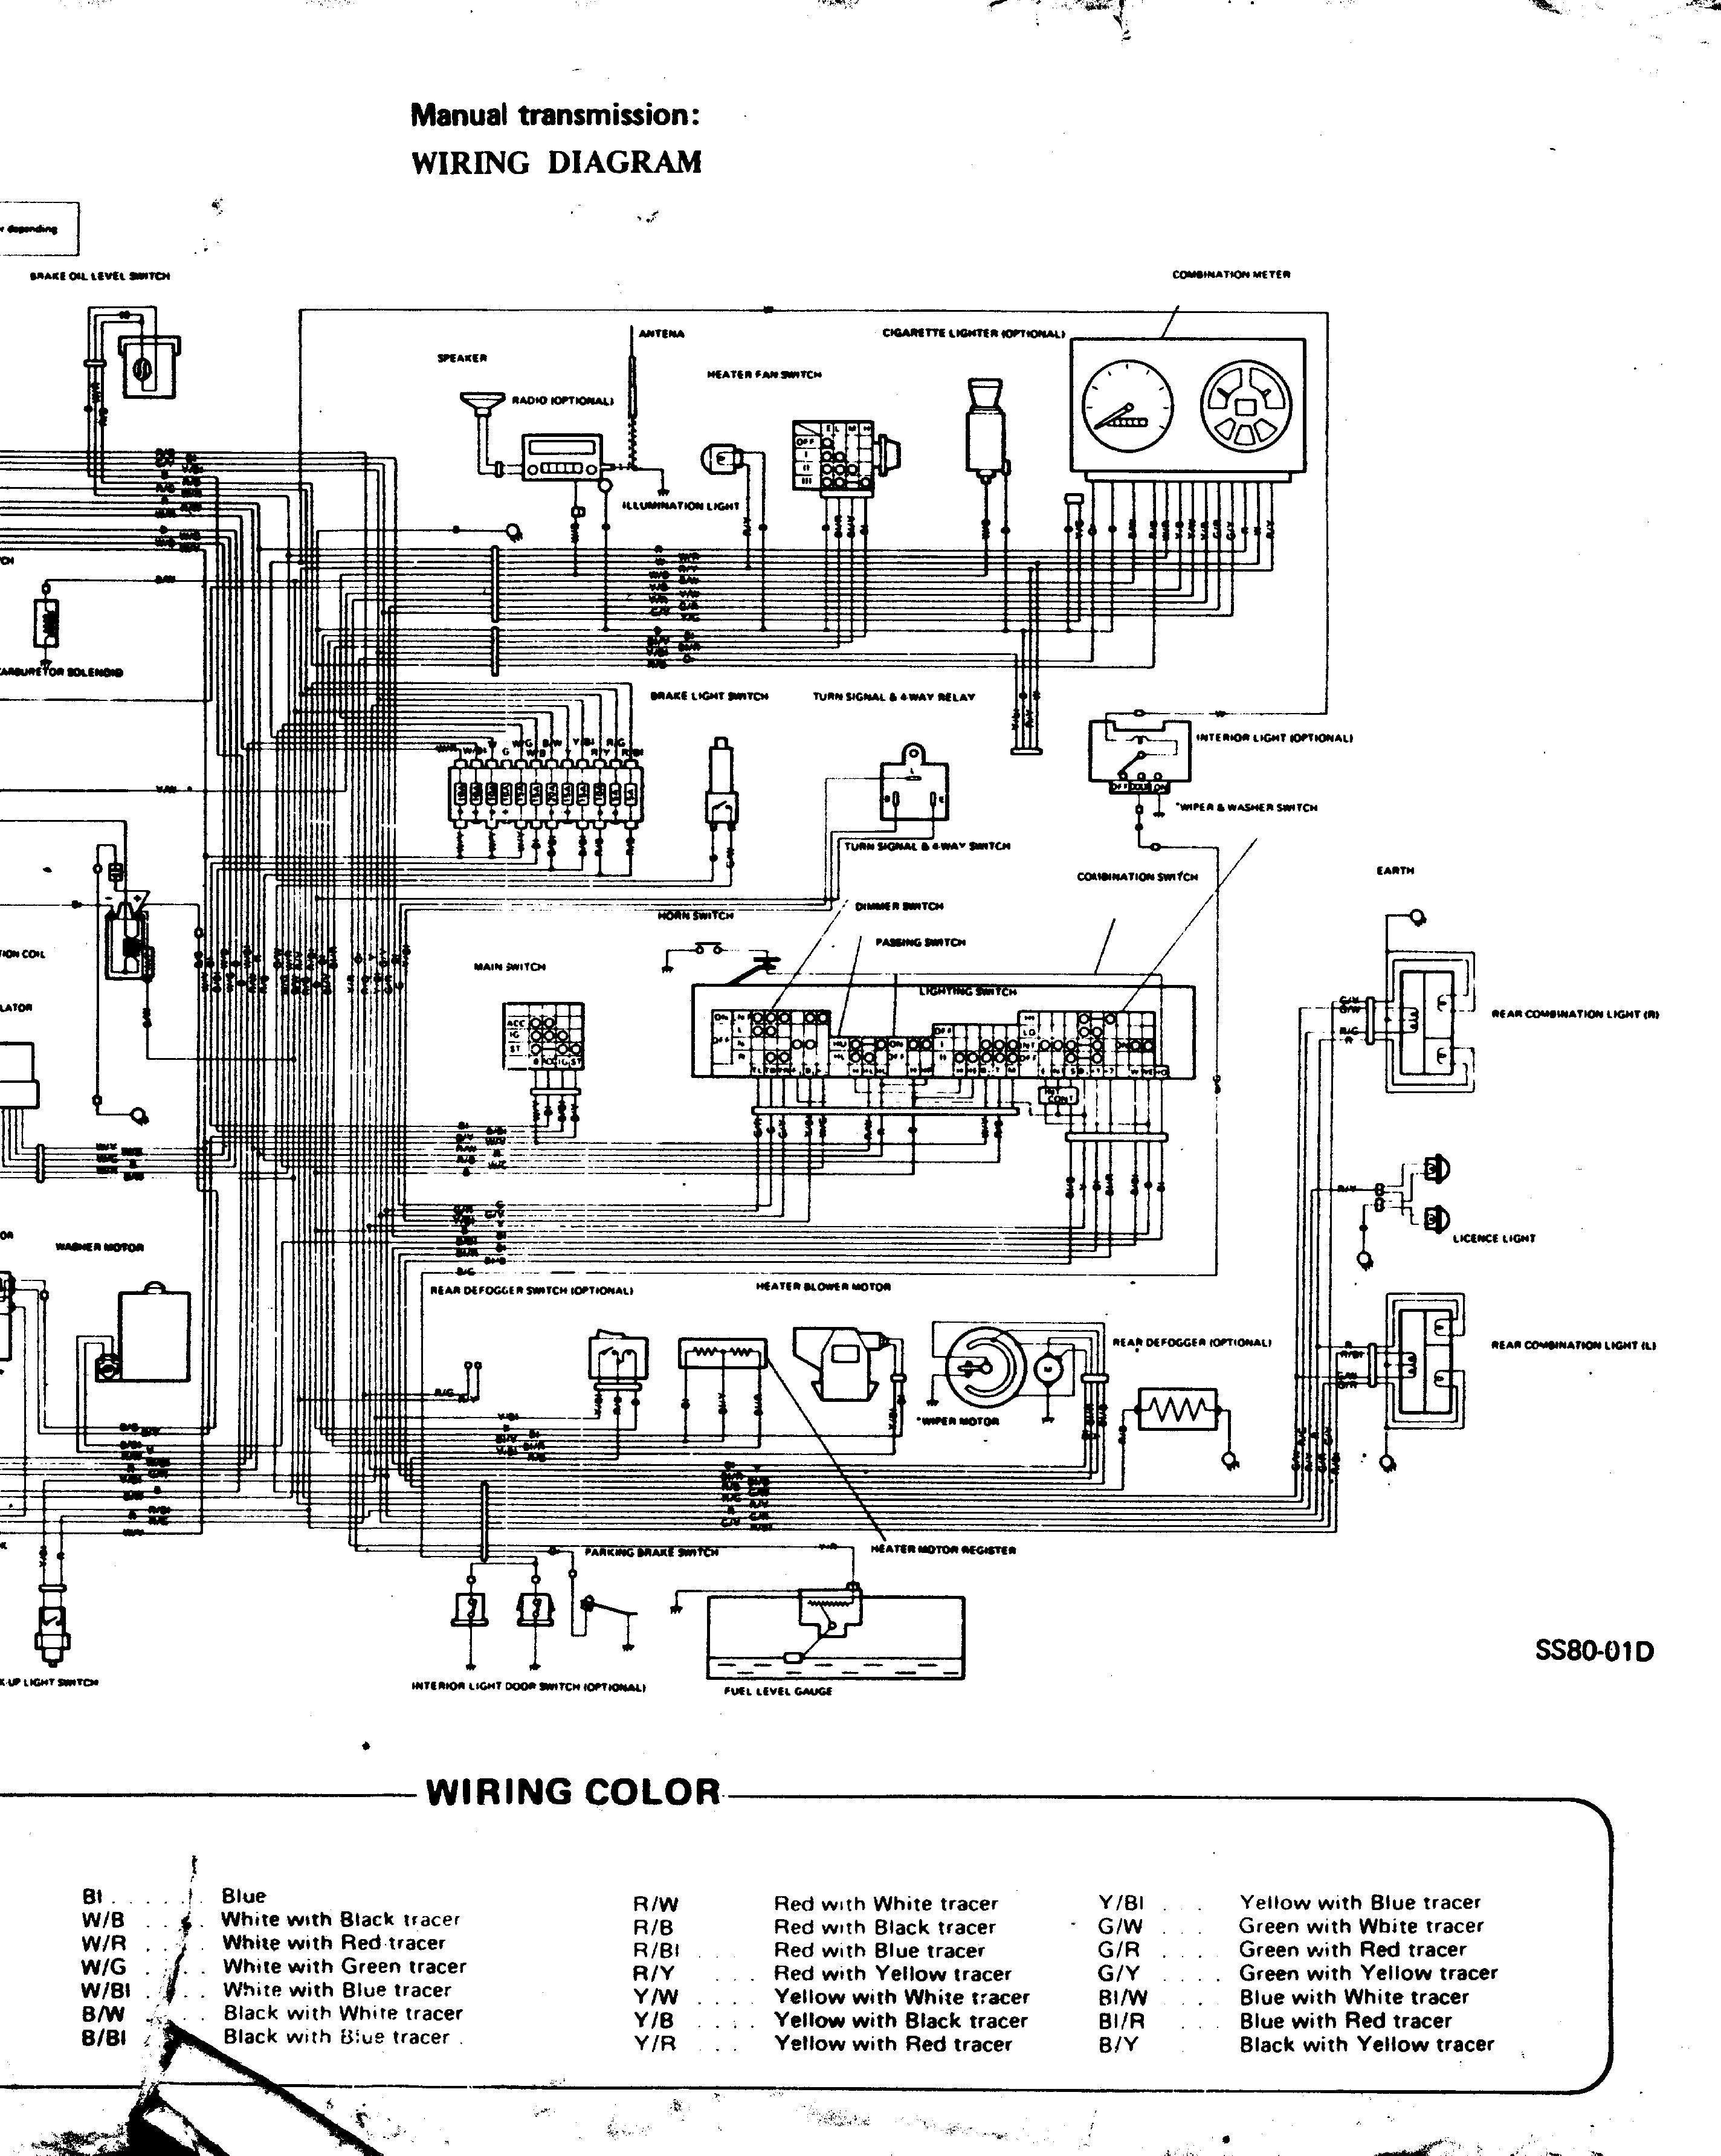 wiring diagram suzuki wagon r k10a